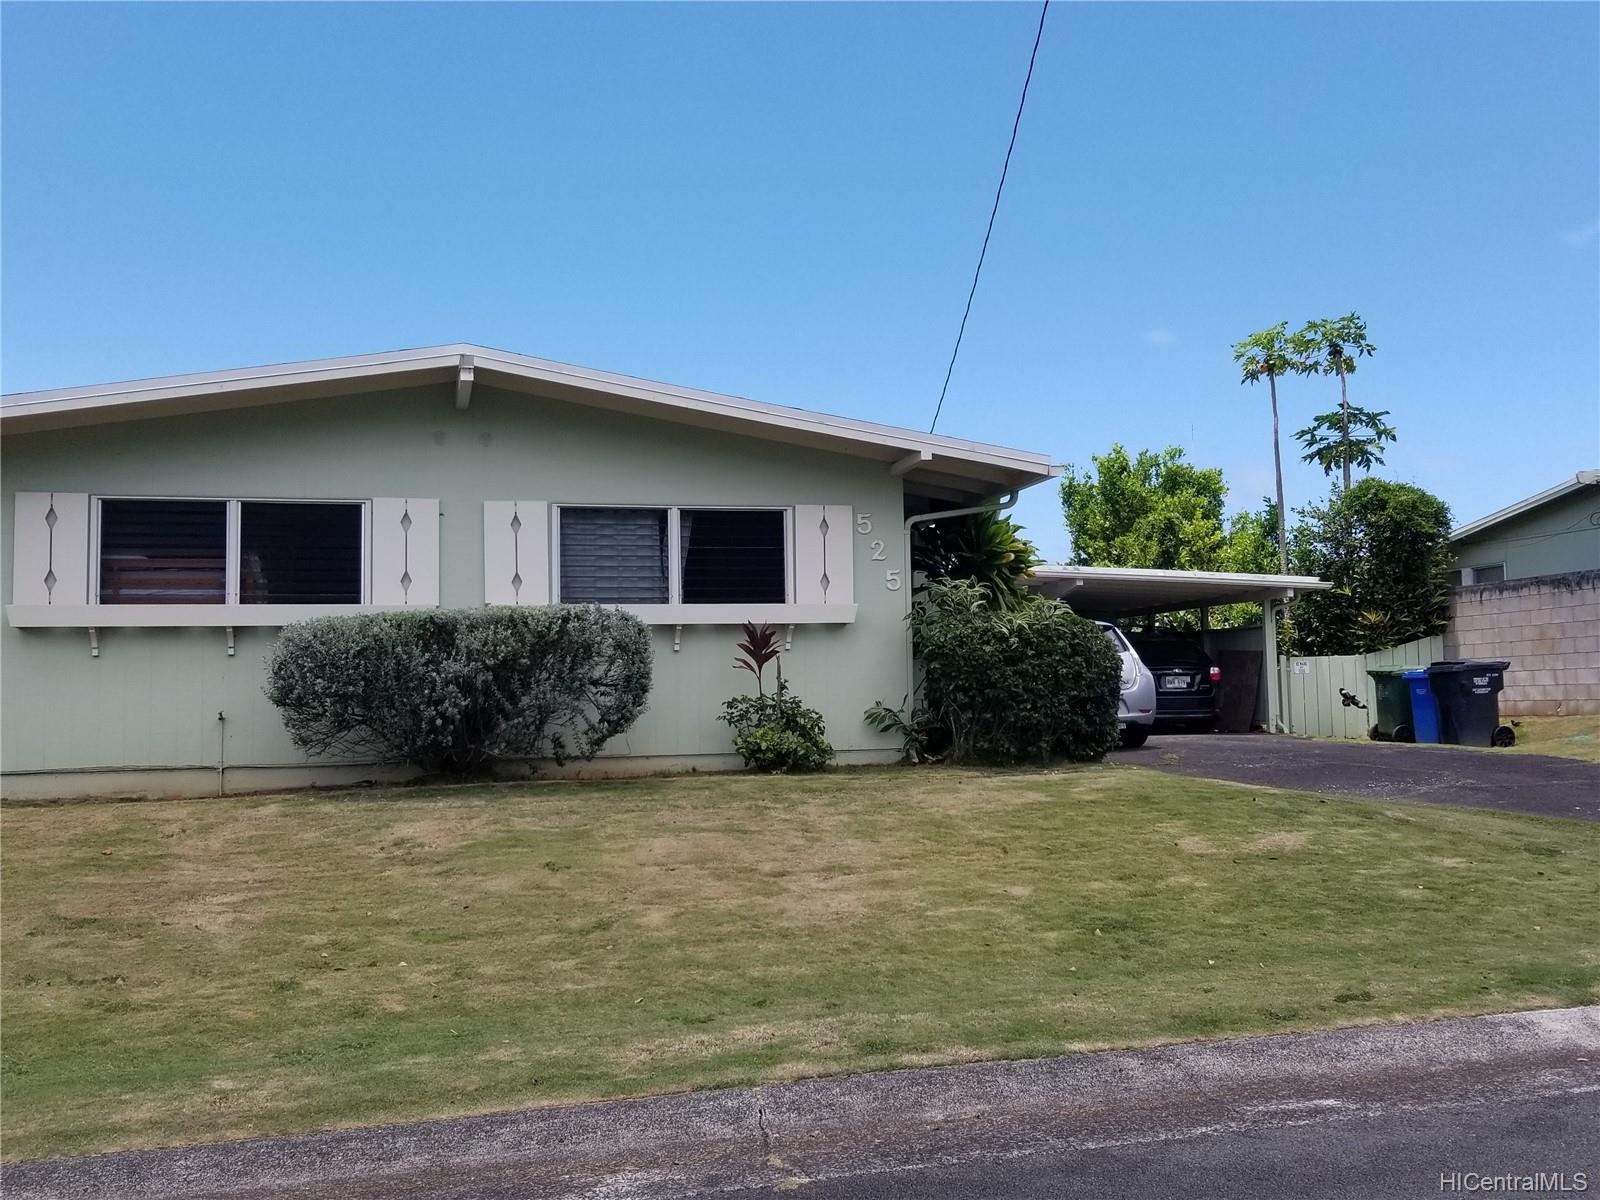 525 Ulukou Street Kailua - Rental - photo 1 of 7